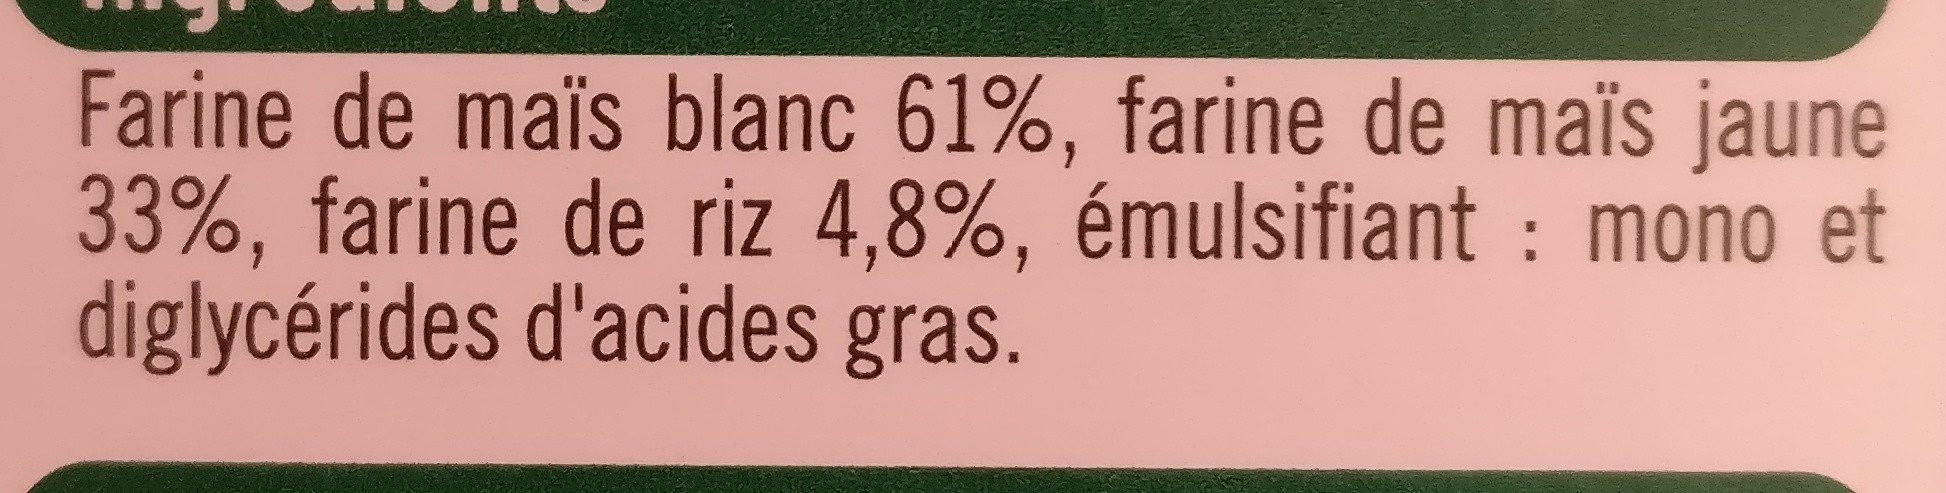 Penne - Ingrédients